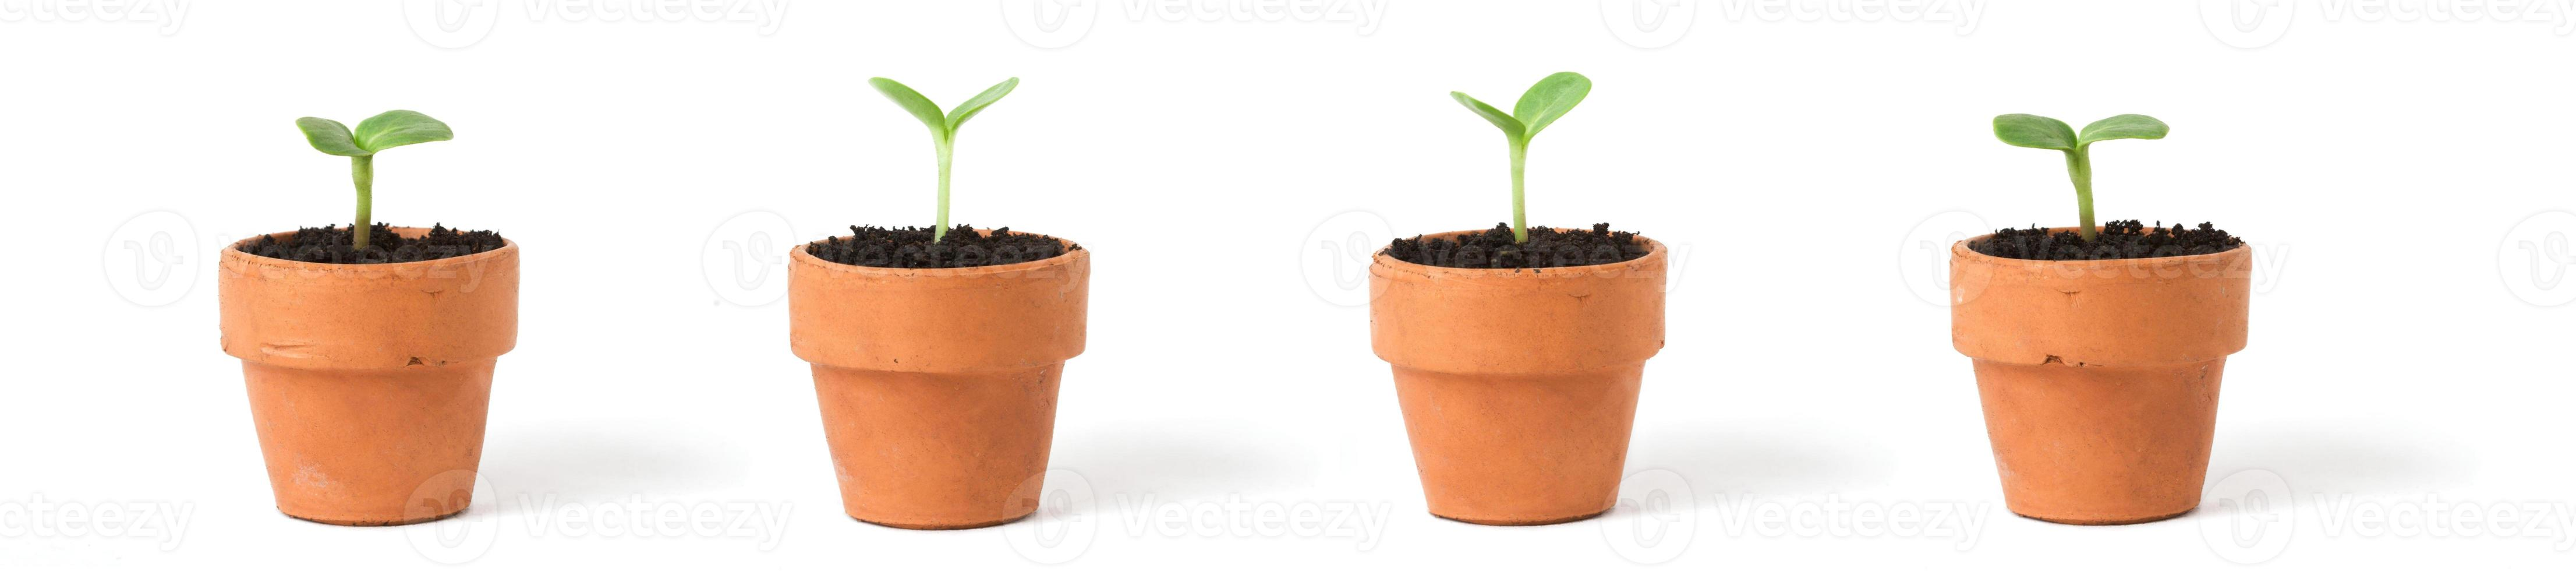 Pots on White photo